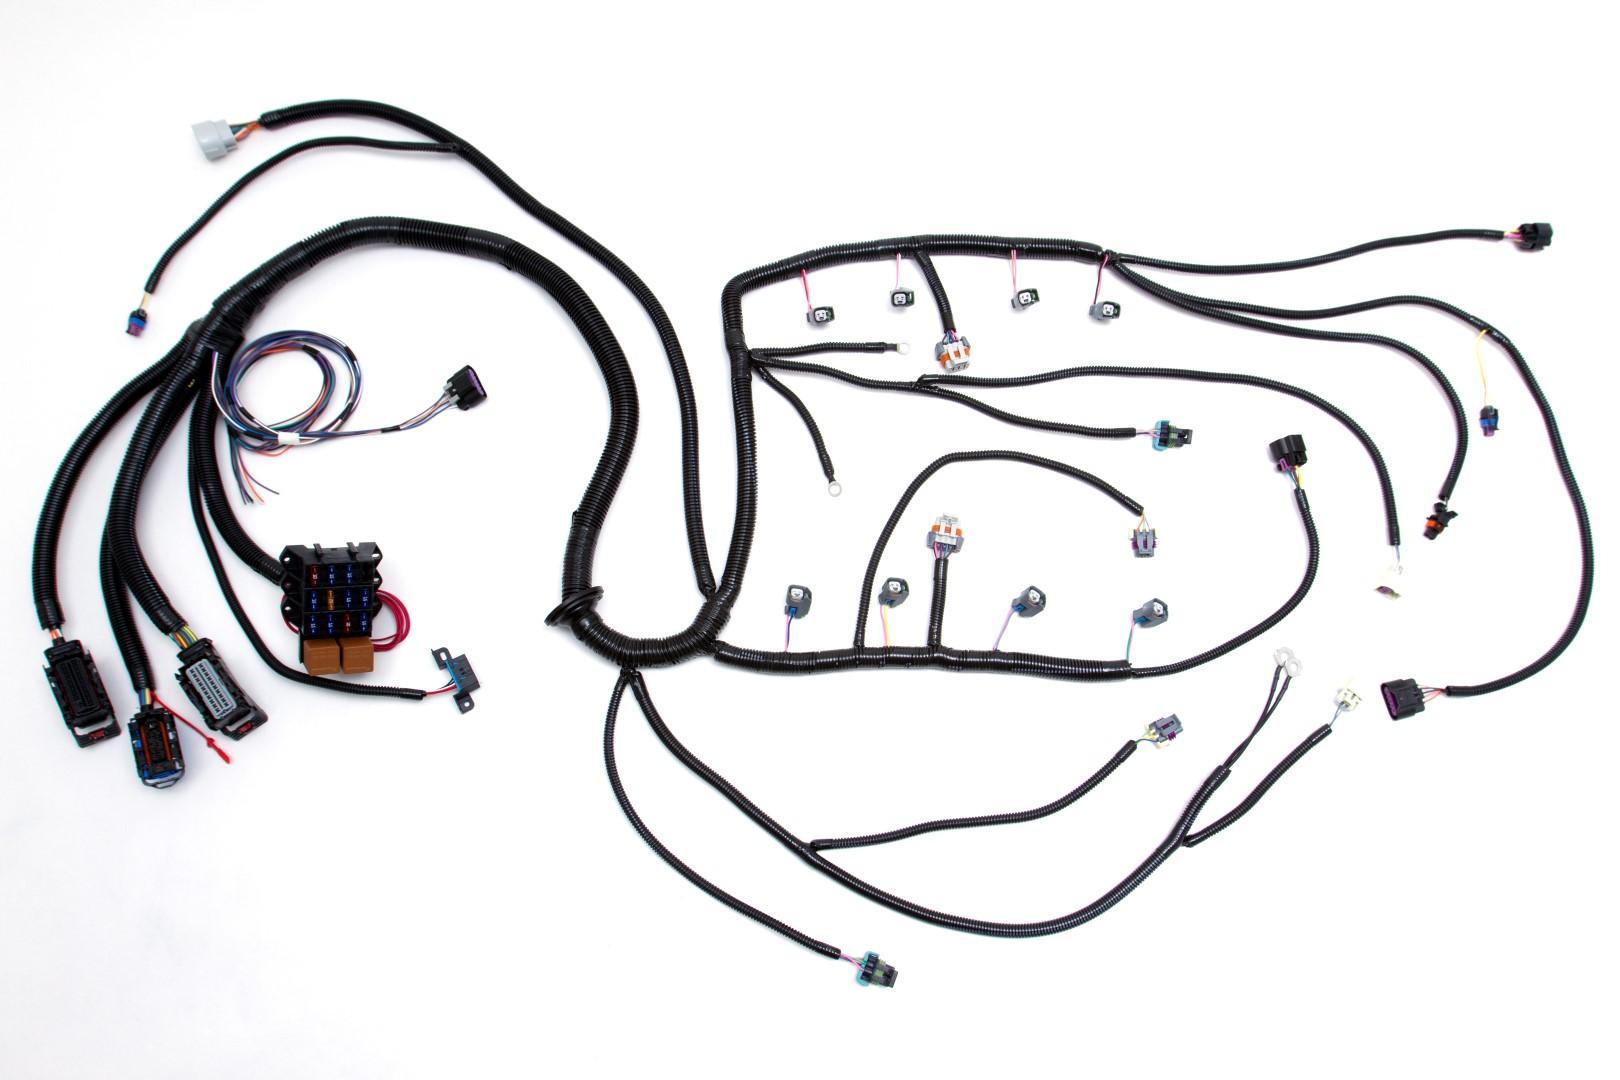 10 13 L99 6 2l Standalone Wiring Harness W 4l60e